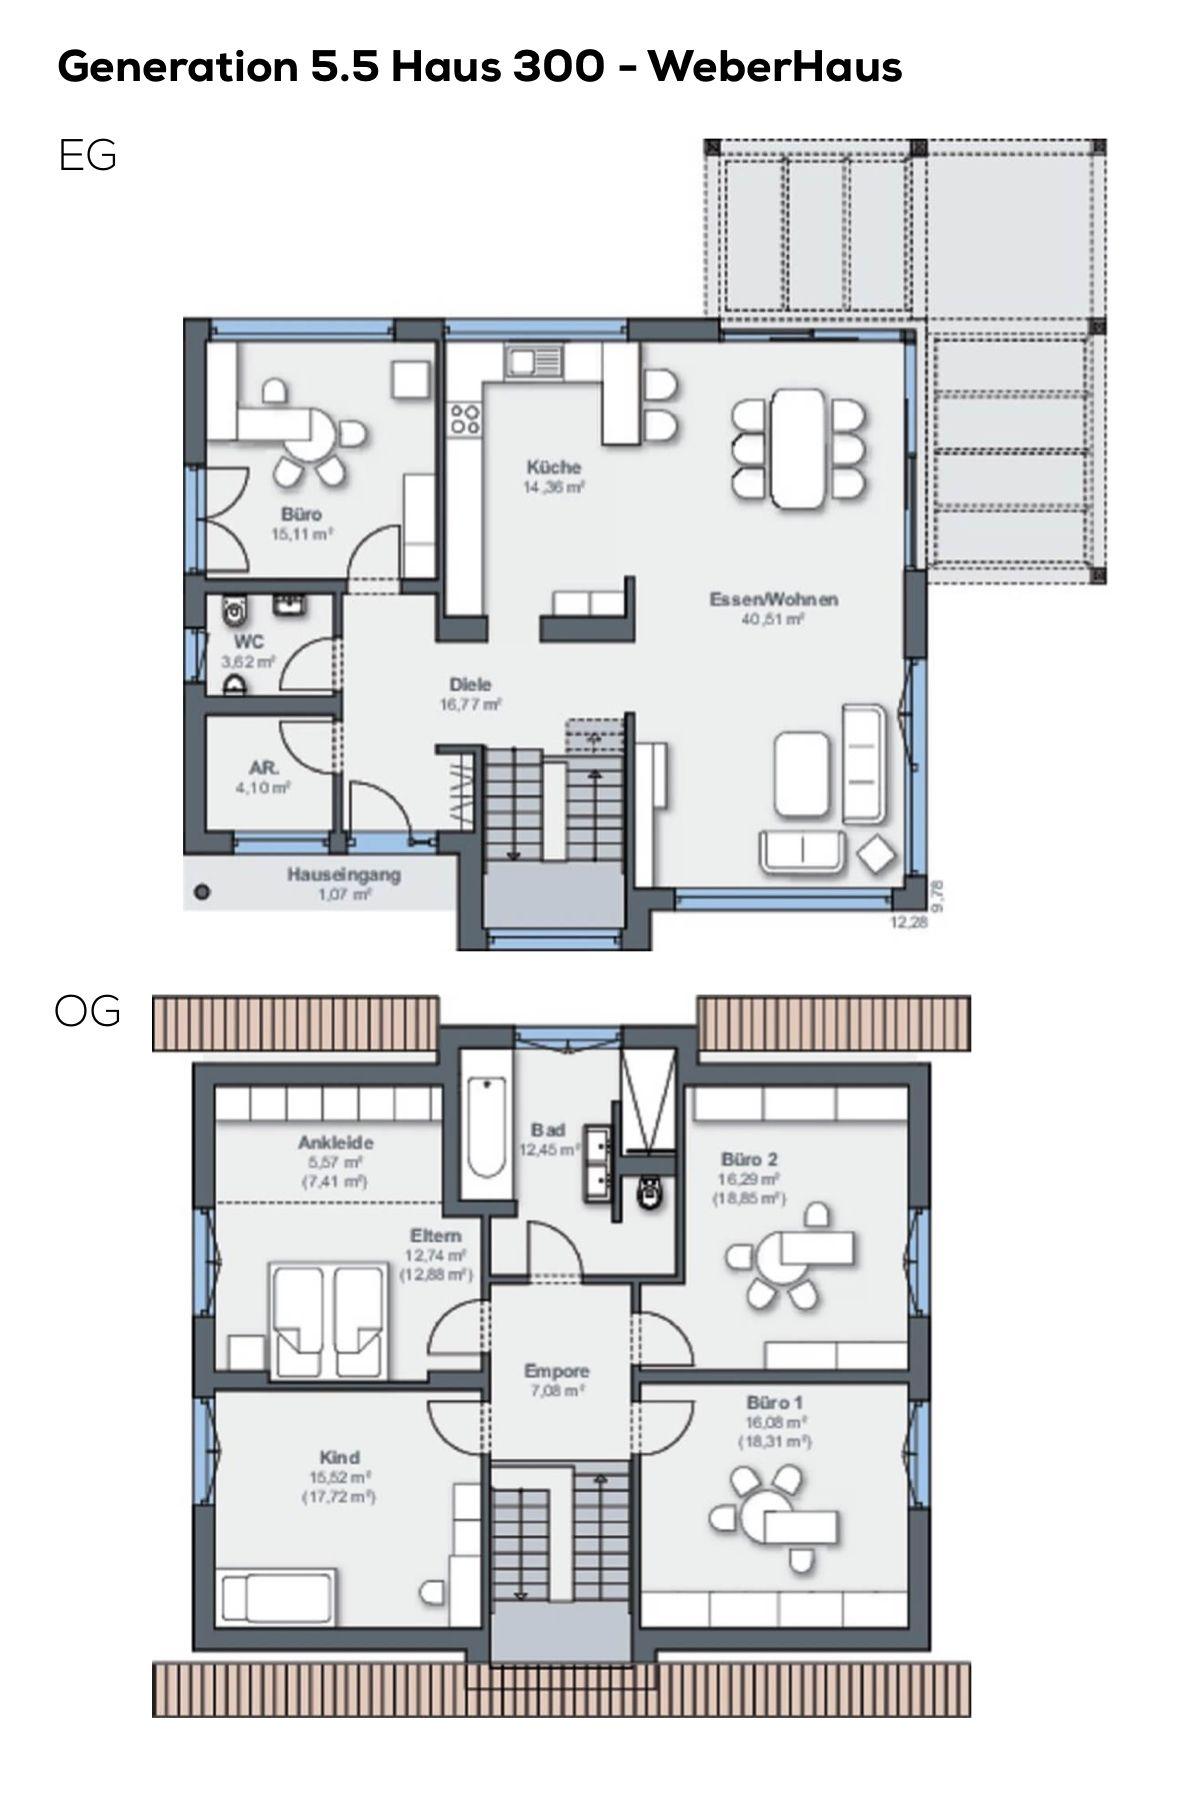 grundriss einfamilienhaus 6 zimmer ohne keller offene k che arbeitszimmer pergola anbau. Black Bedroom Furniture Sets. Home Design Ideas